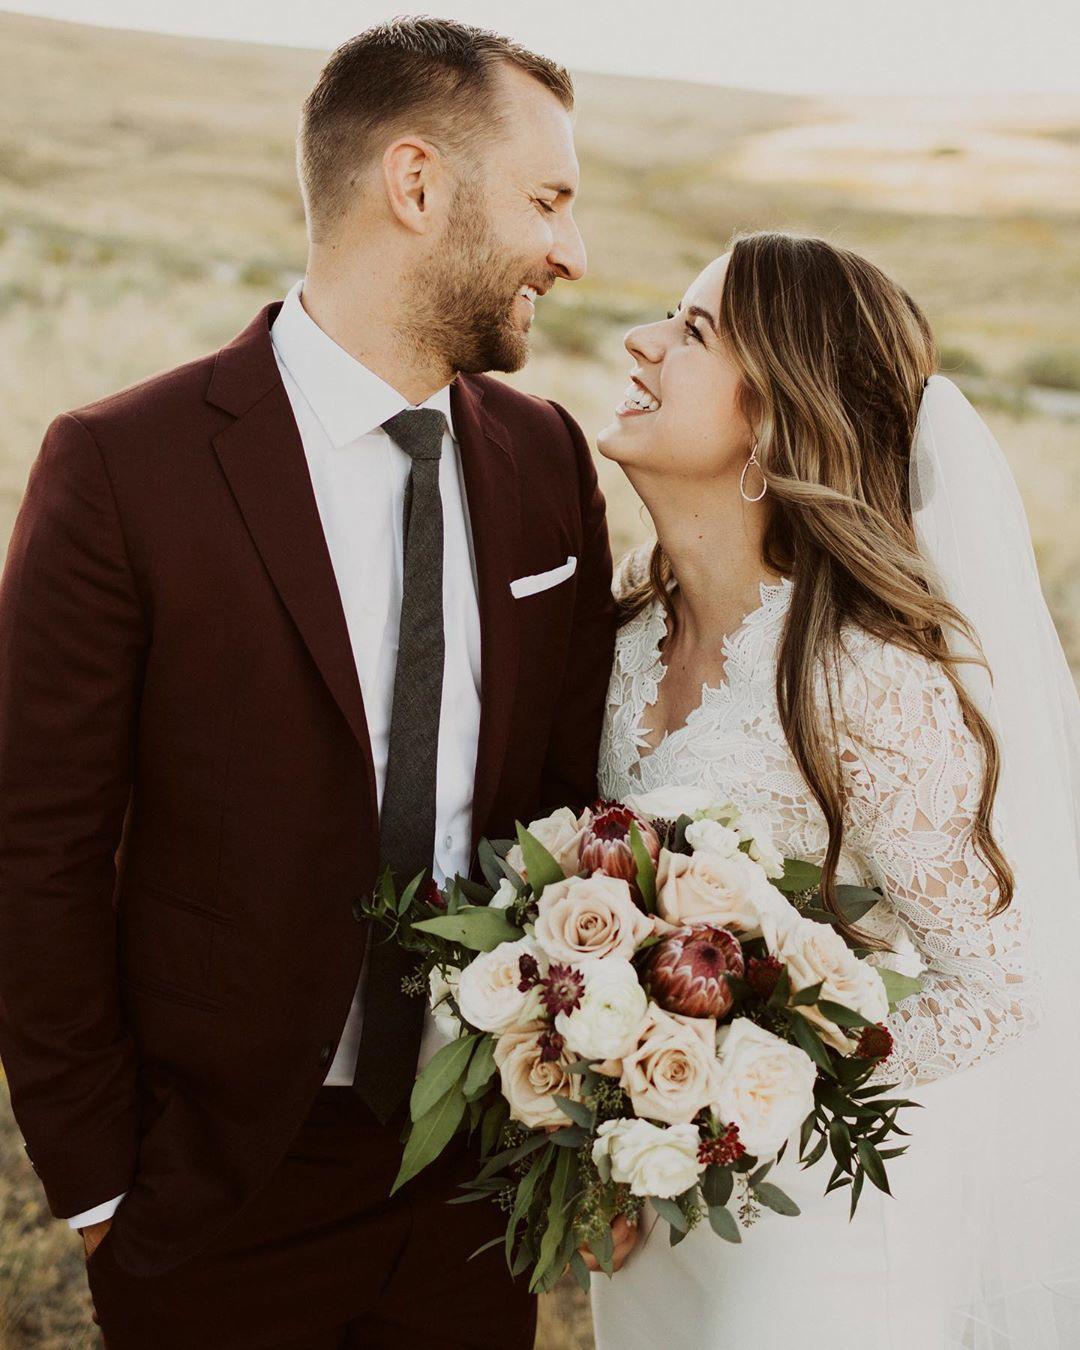 Custom maroon wedding suit by hm clothing wwwhmcole